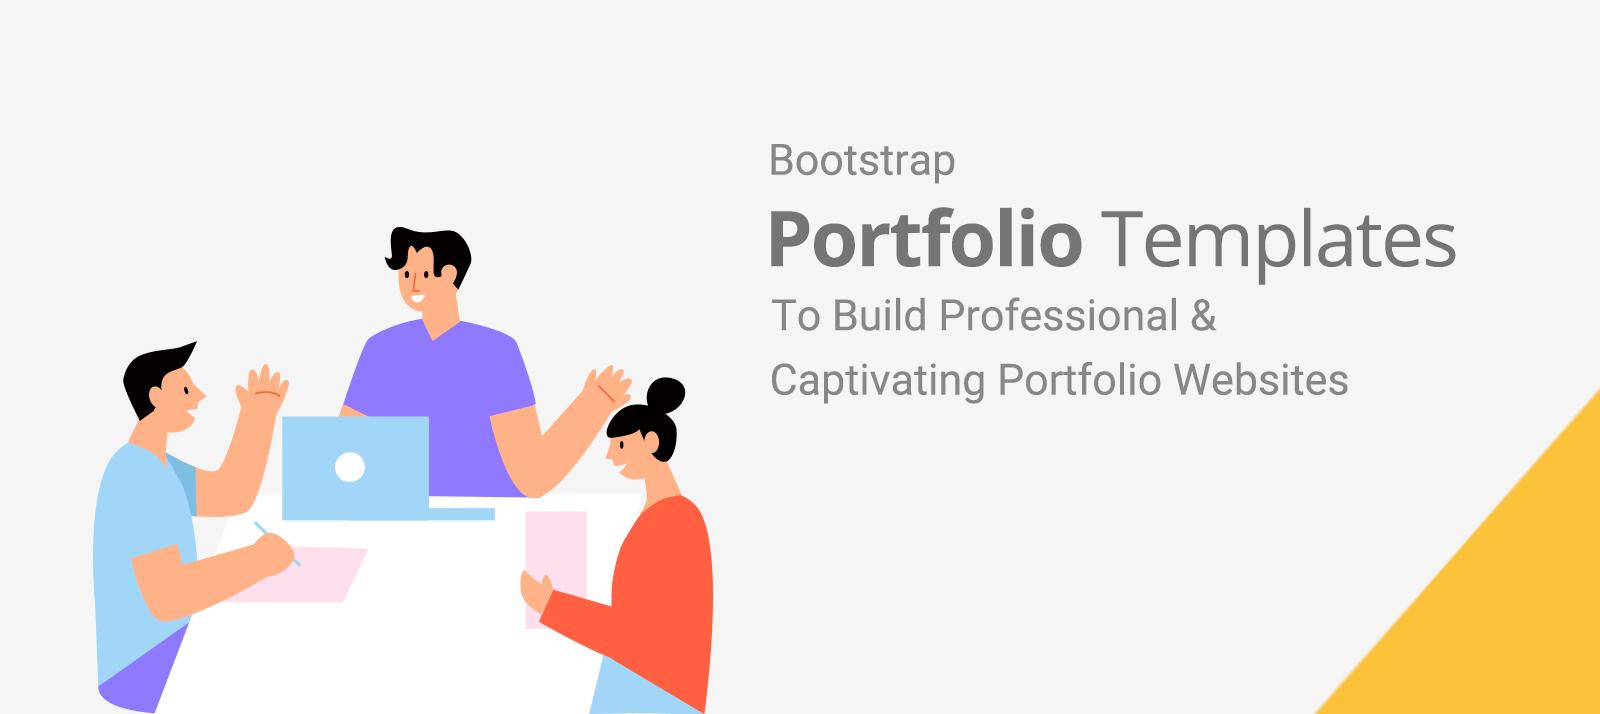 10+ Bootstrap Portfolio Templates To Build Professional & Captivating Portfolio Websites